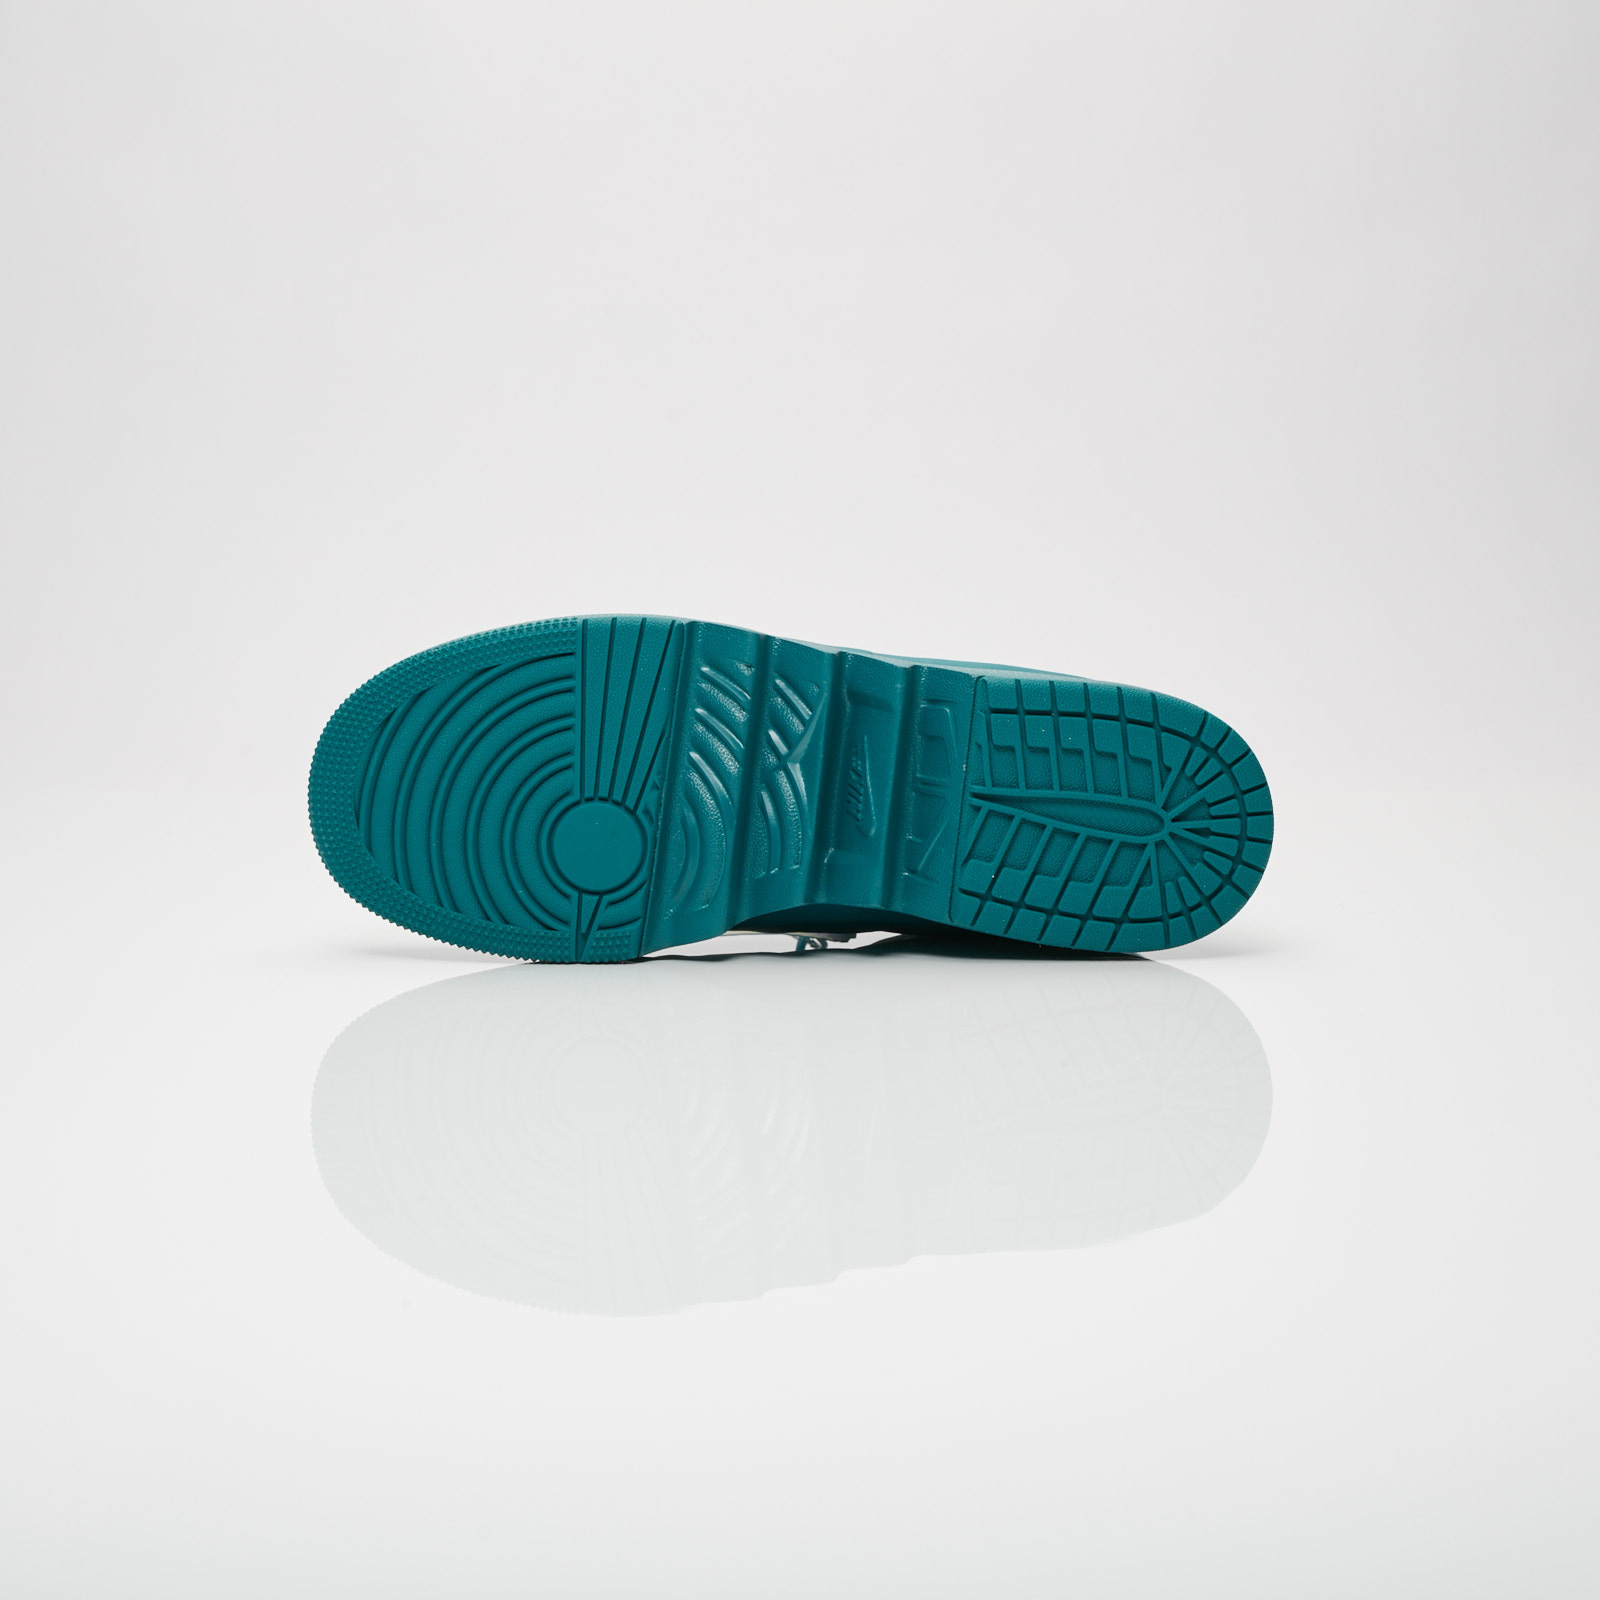 Jordan Brand Wmns Air Jordan 1 Jester XX - Ao1265-300 ... 58bc4514370d